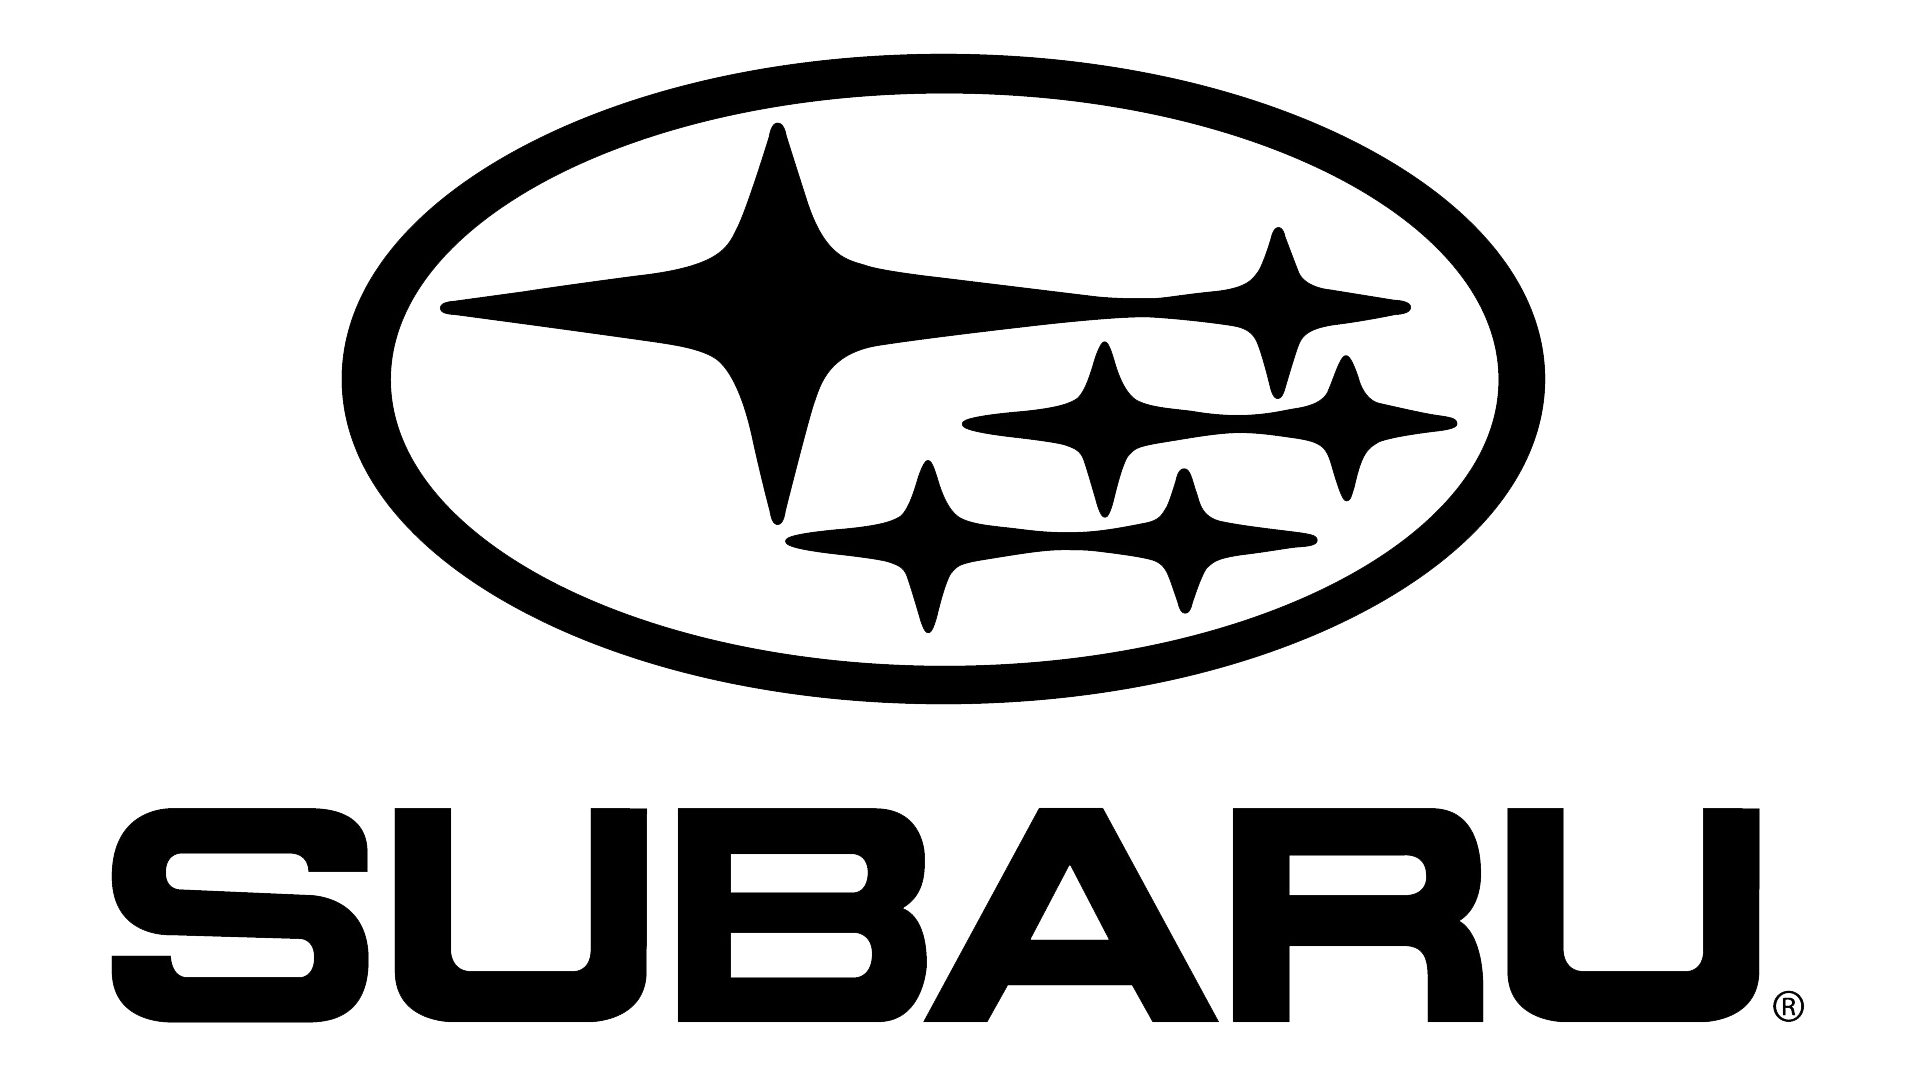 subaru logo hd png meaning information carlogos org rh carlogos org subaru logo white png subaru logo pms